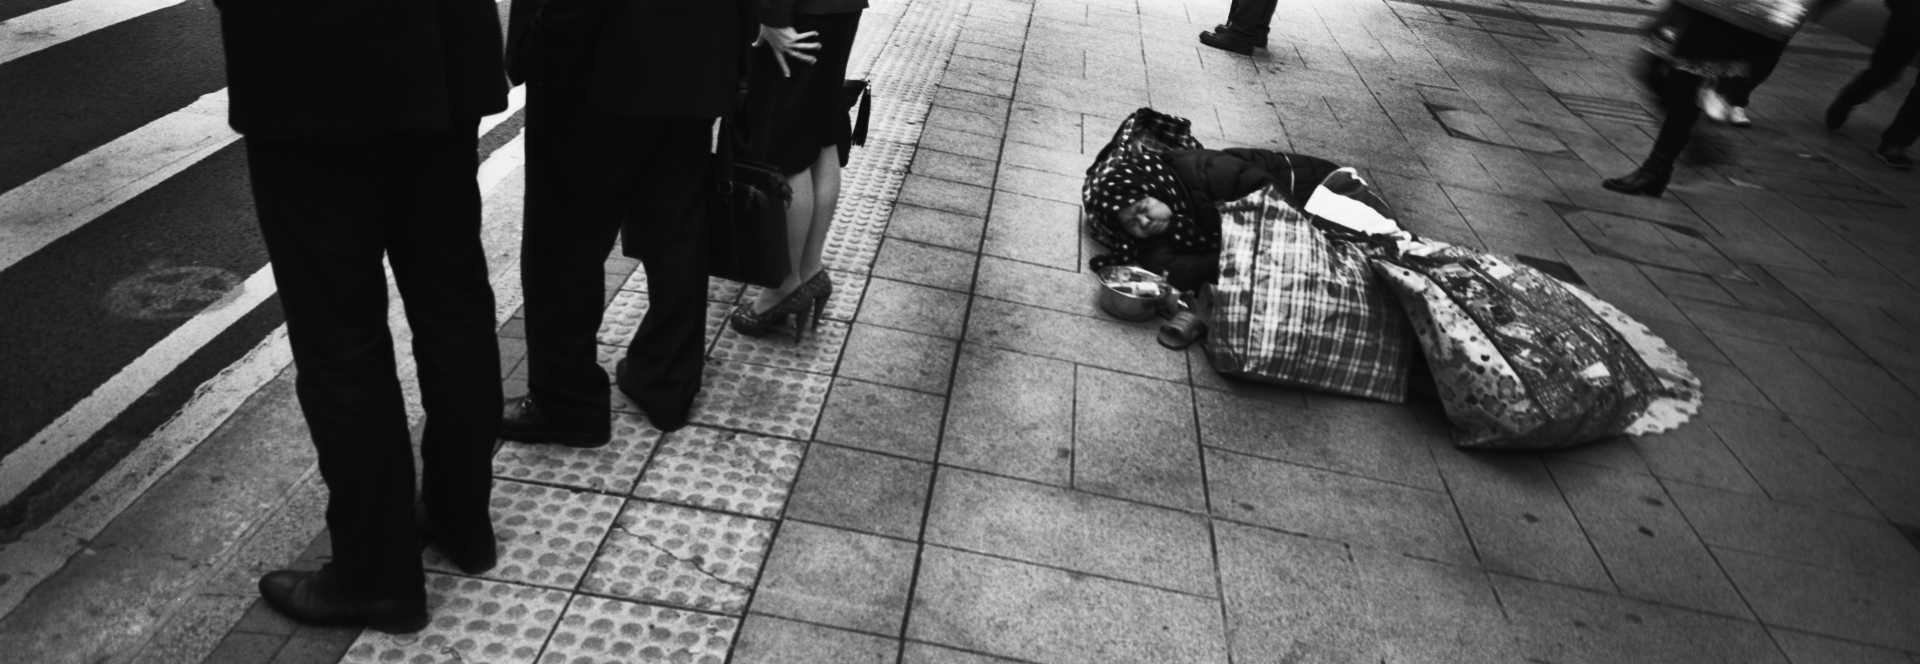 """Inequality"" Hong Kong."